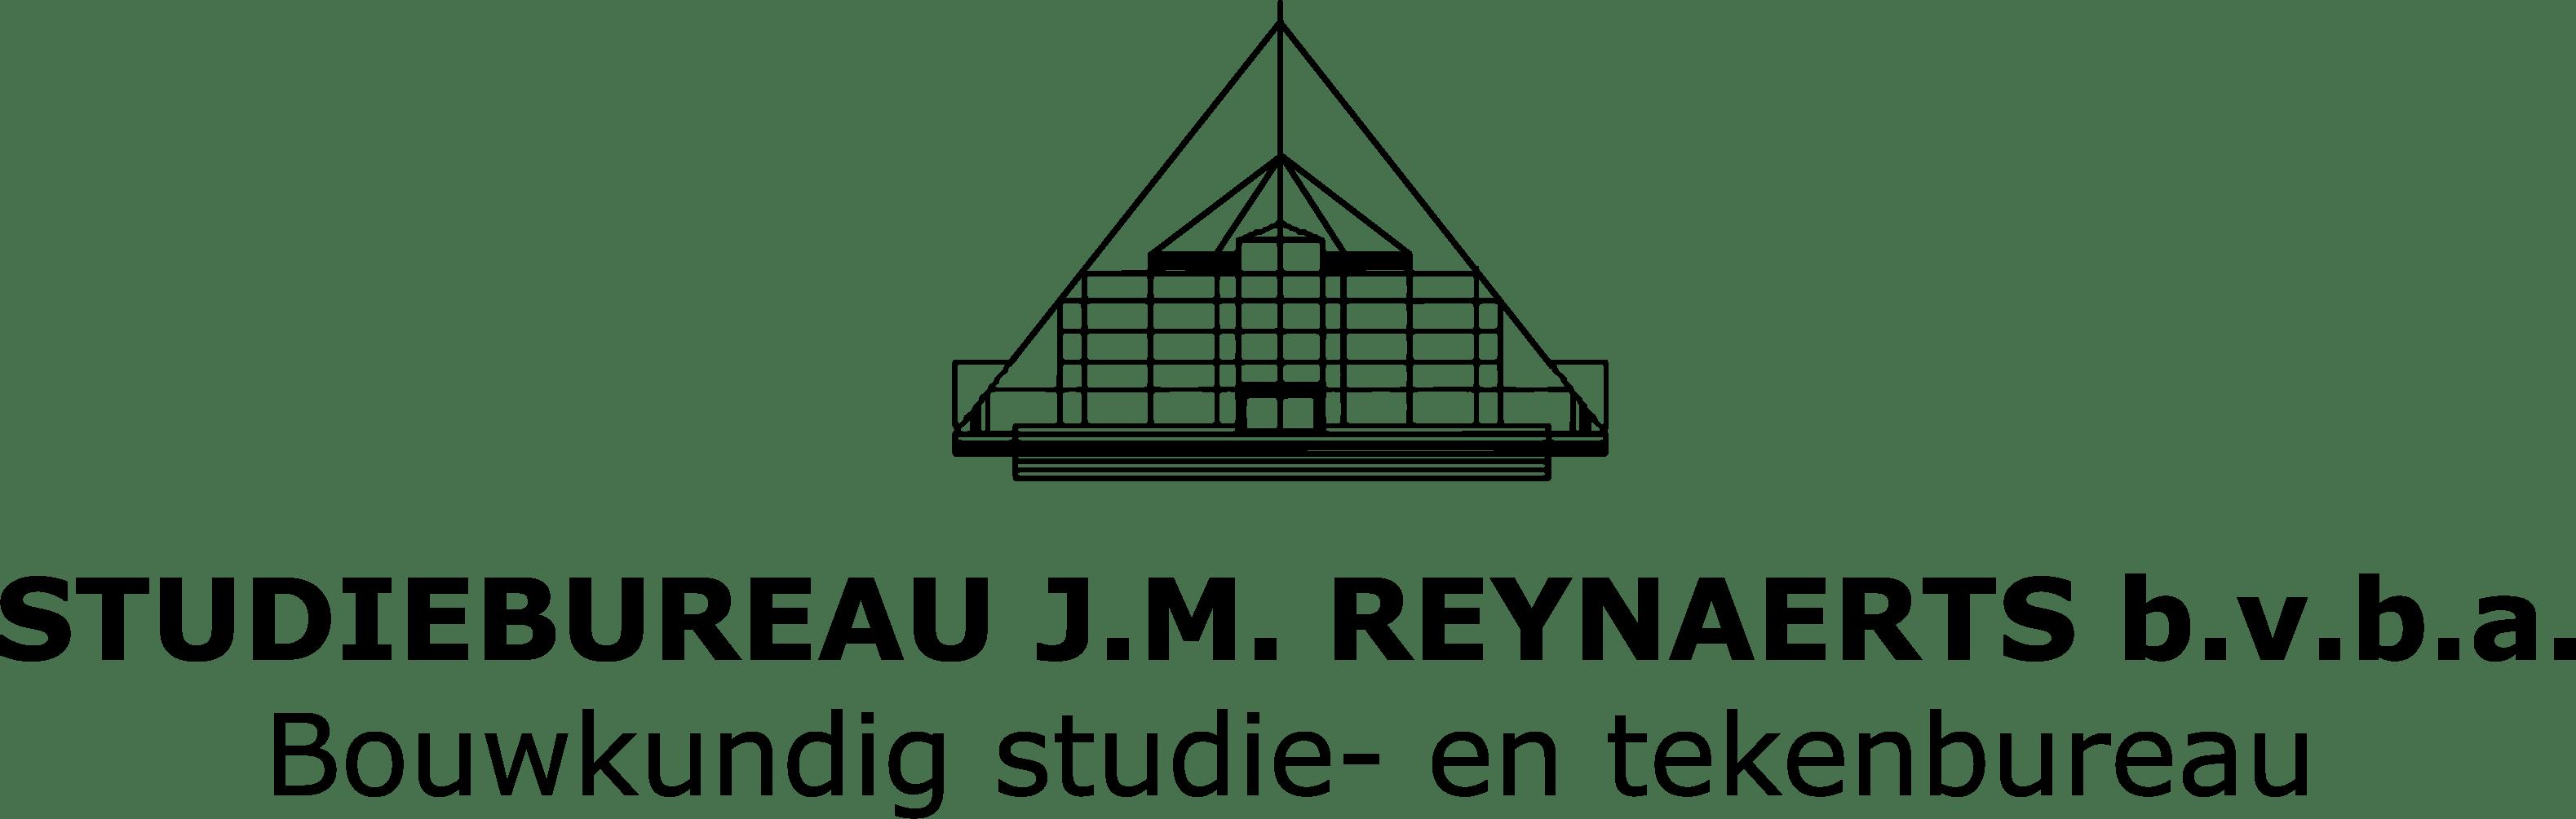 Studiebureau J.M. REYNAERTS b.v.b.a.